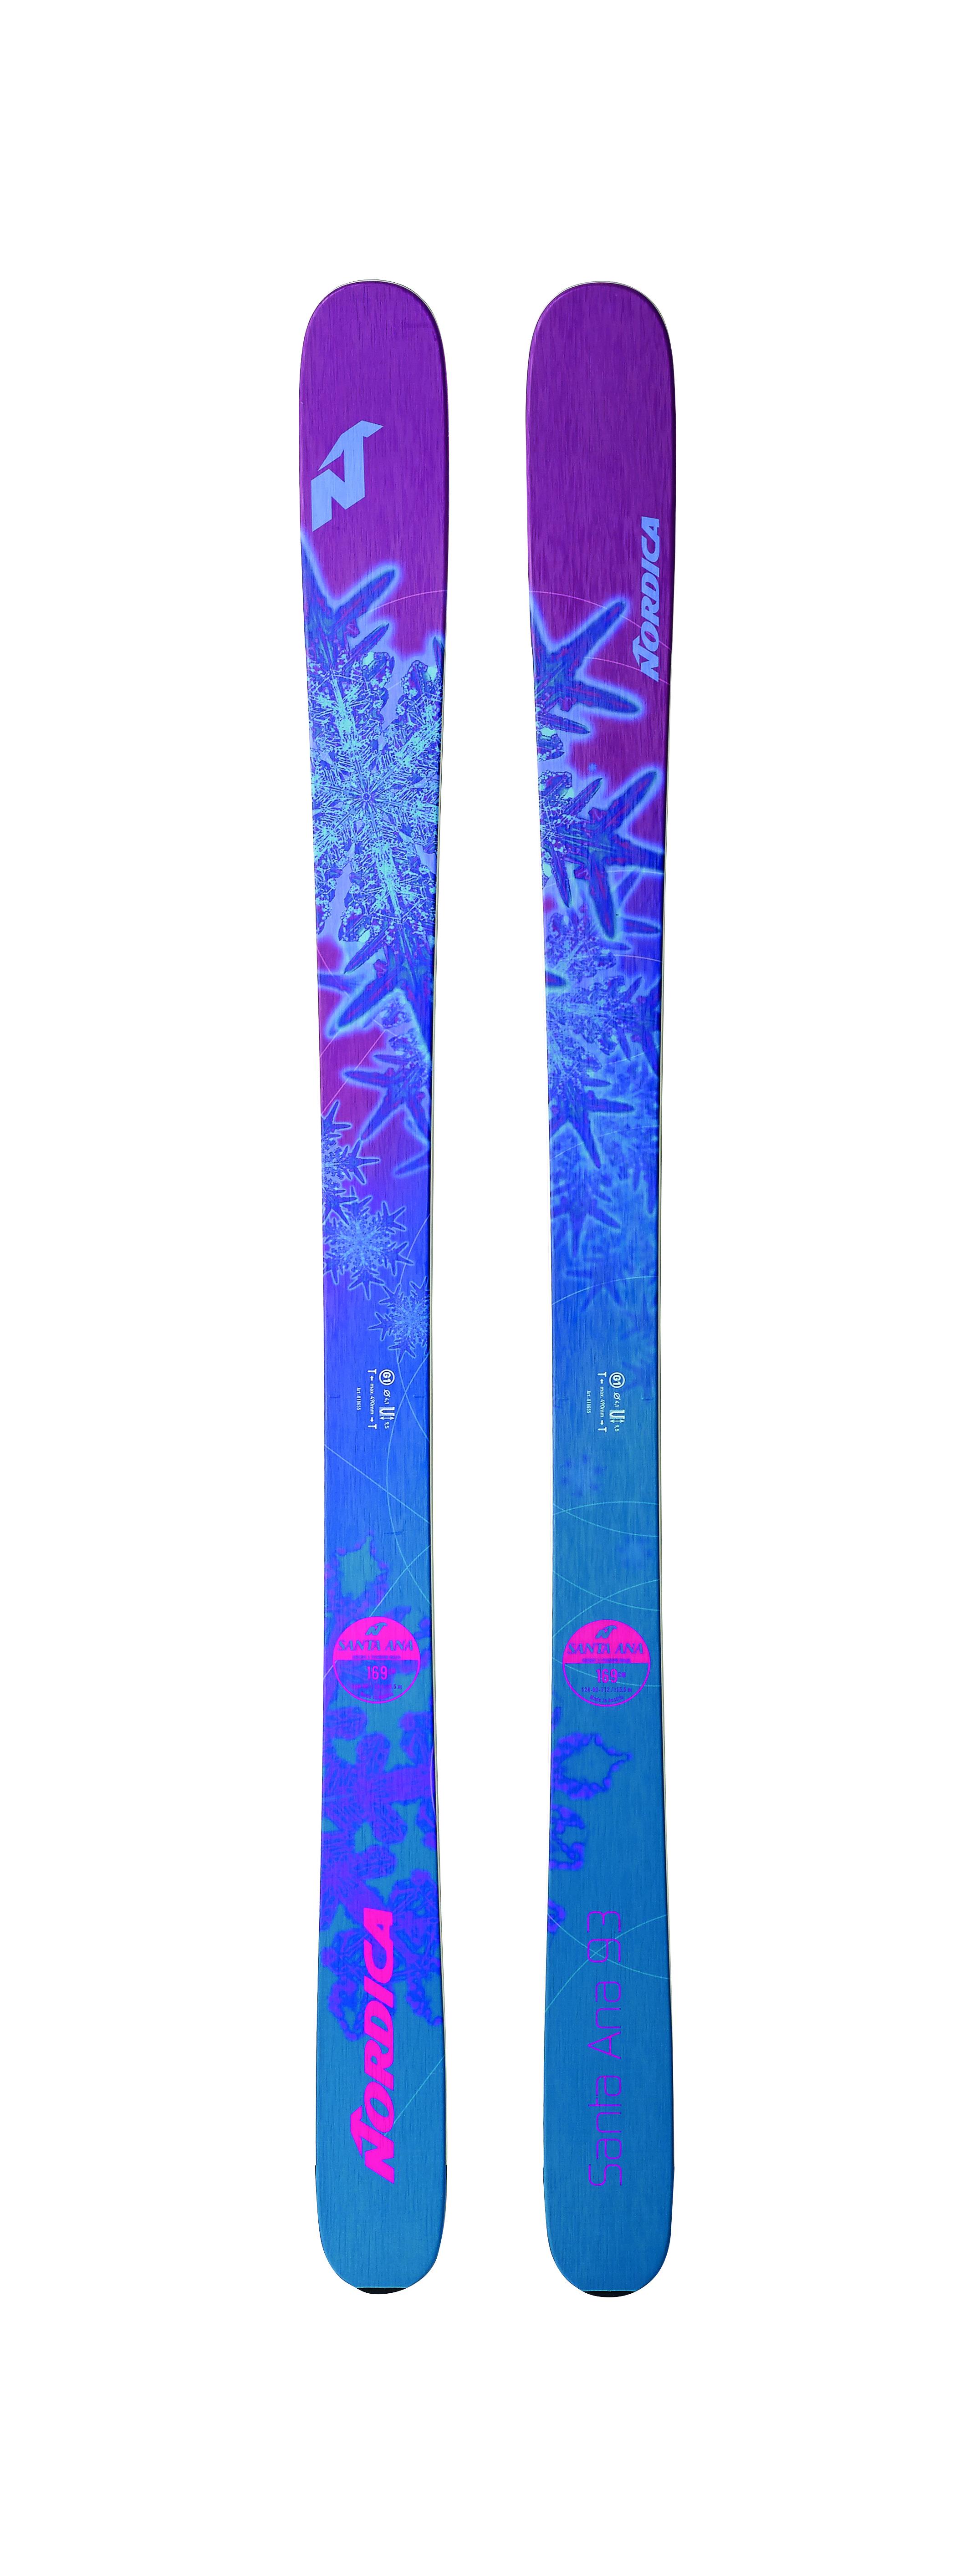 Nordica Santa Ana 93 Womens Ski 2018 b2a2940eb903